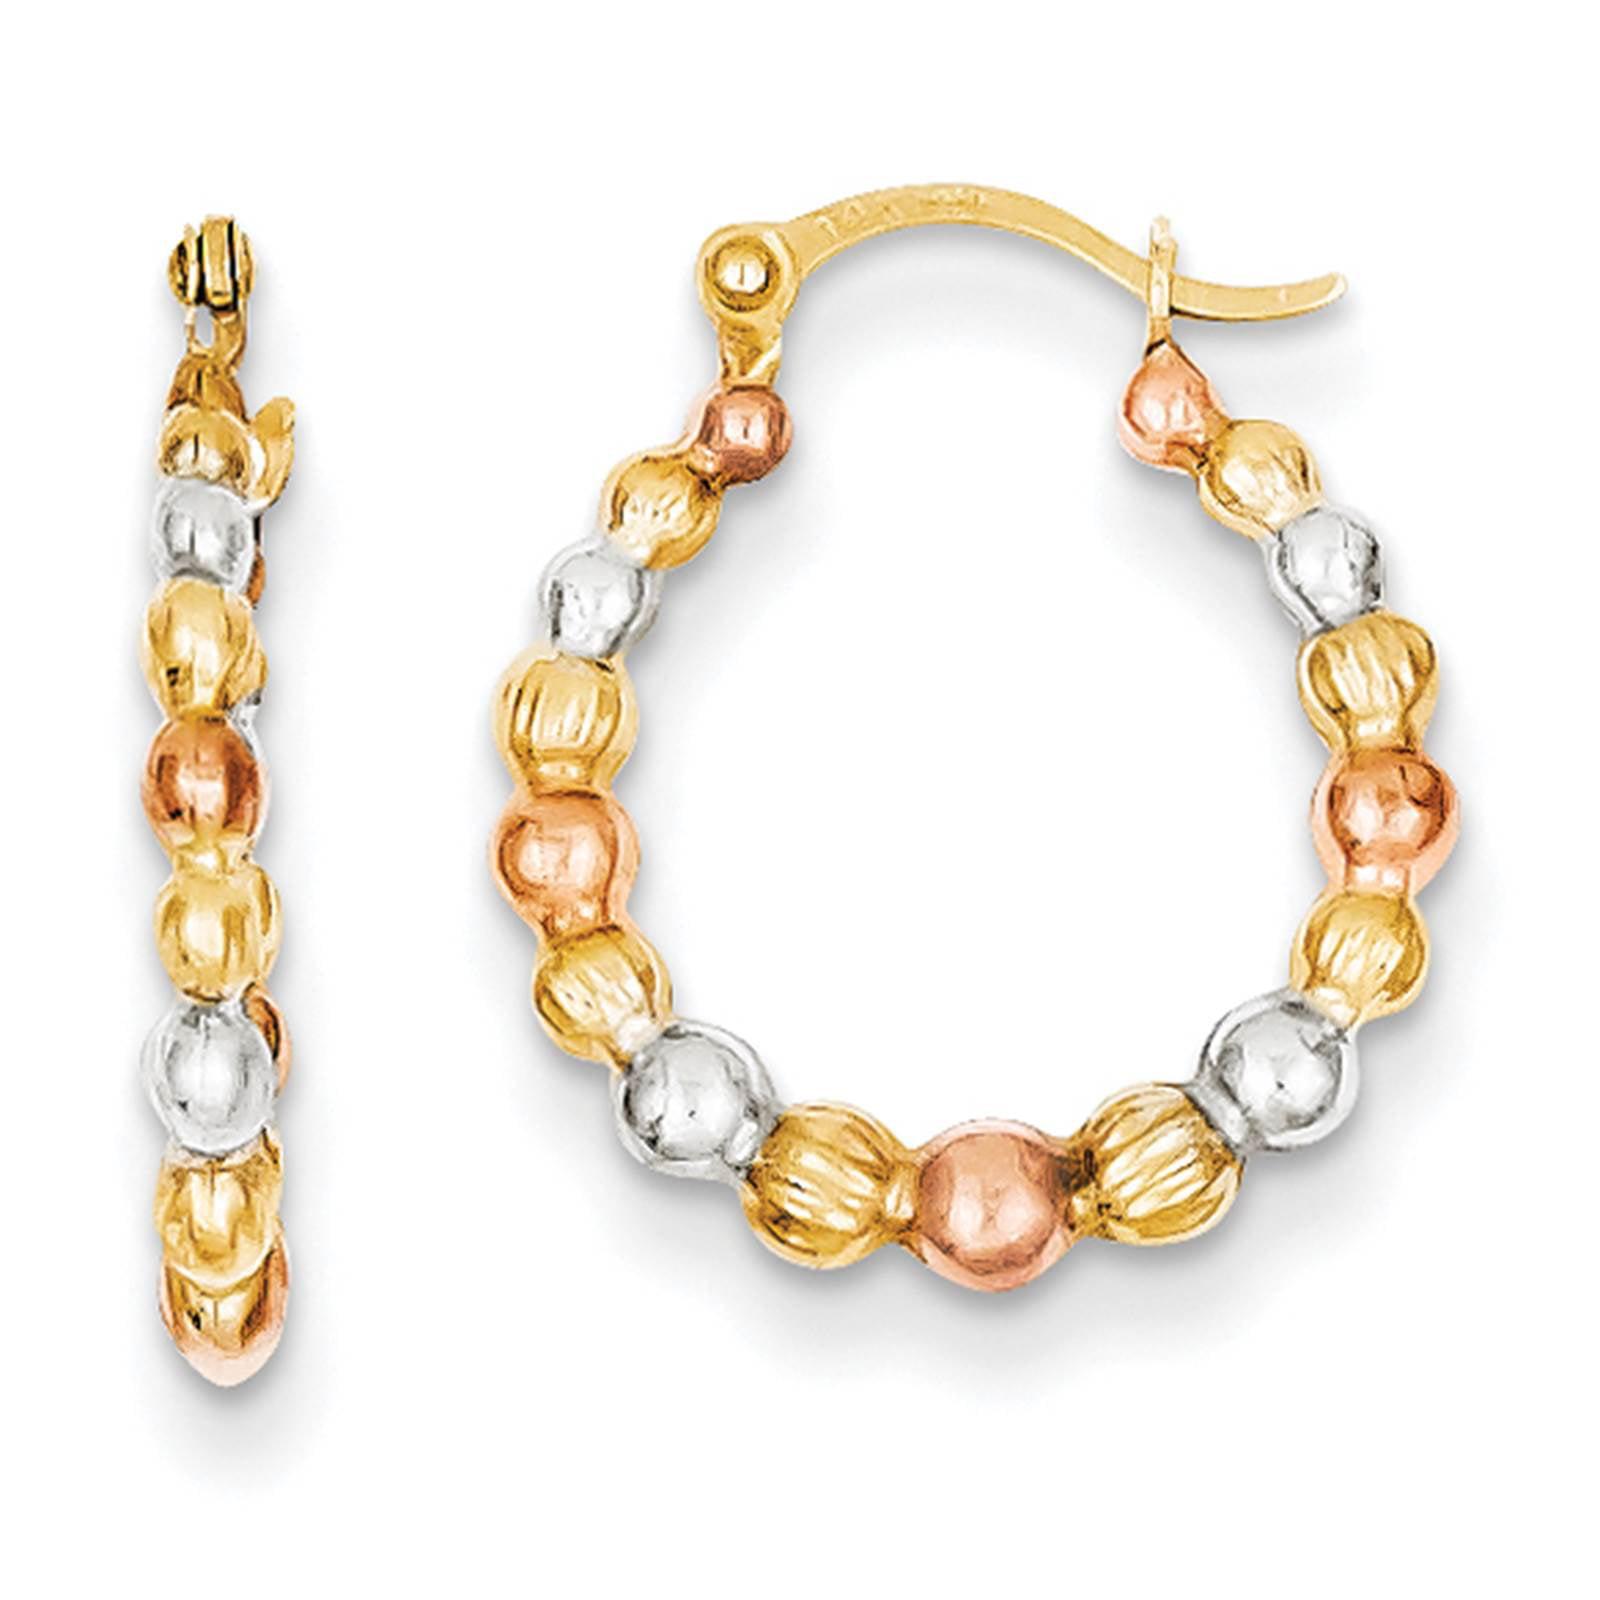 14k Yellow Gold /& Rhodium Heart Hollow Hinged Post Hoop Earrings 12mm x 2mm